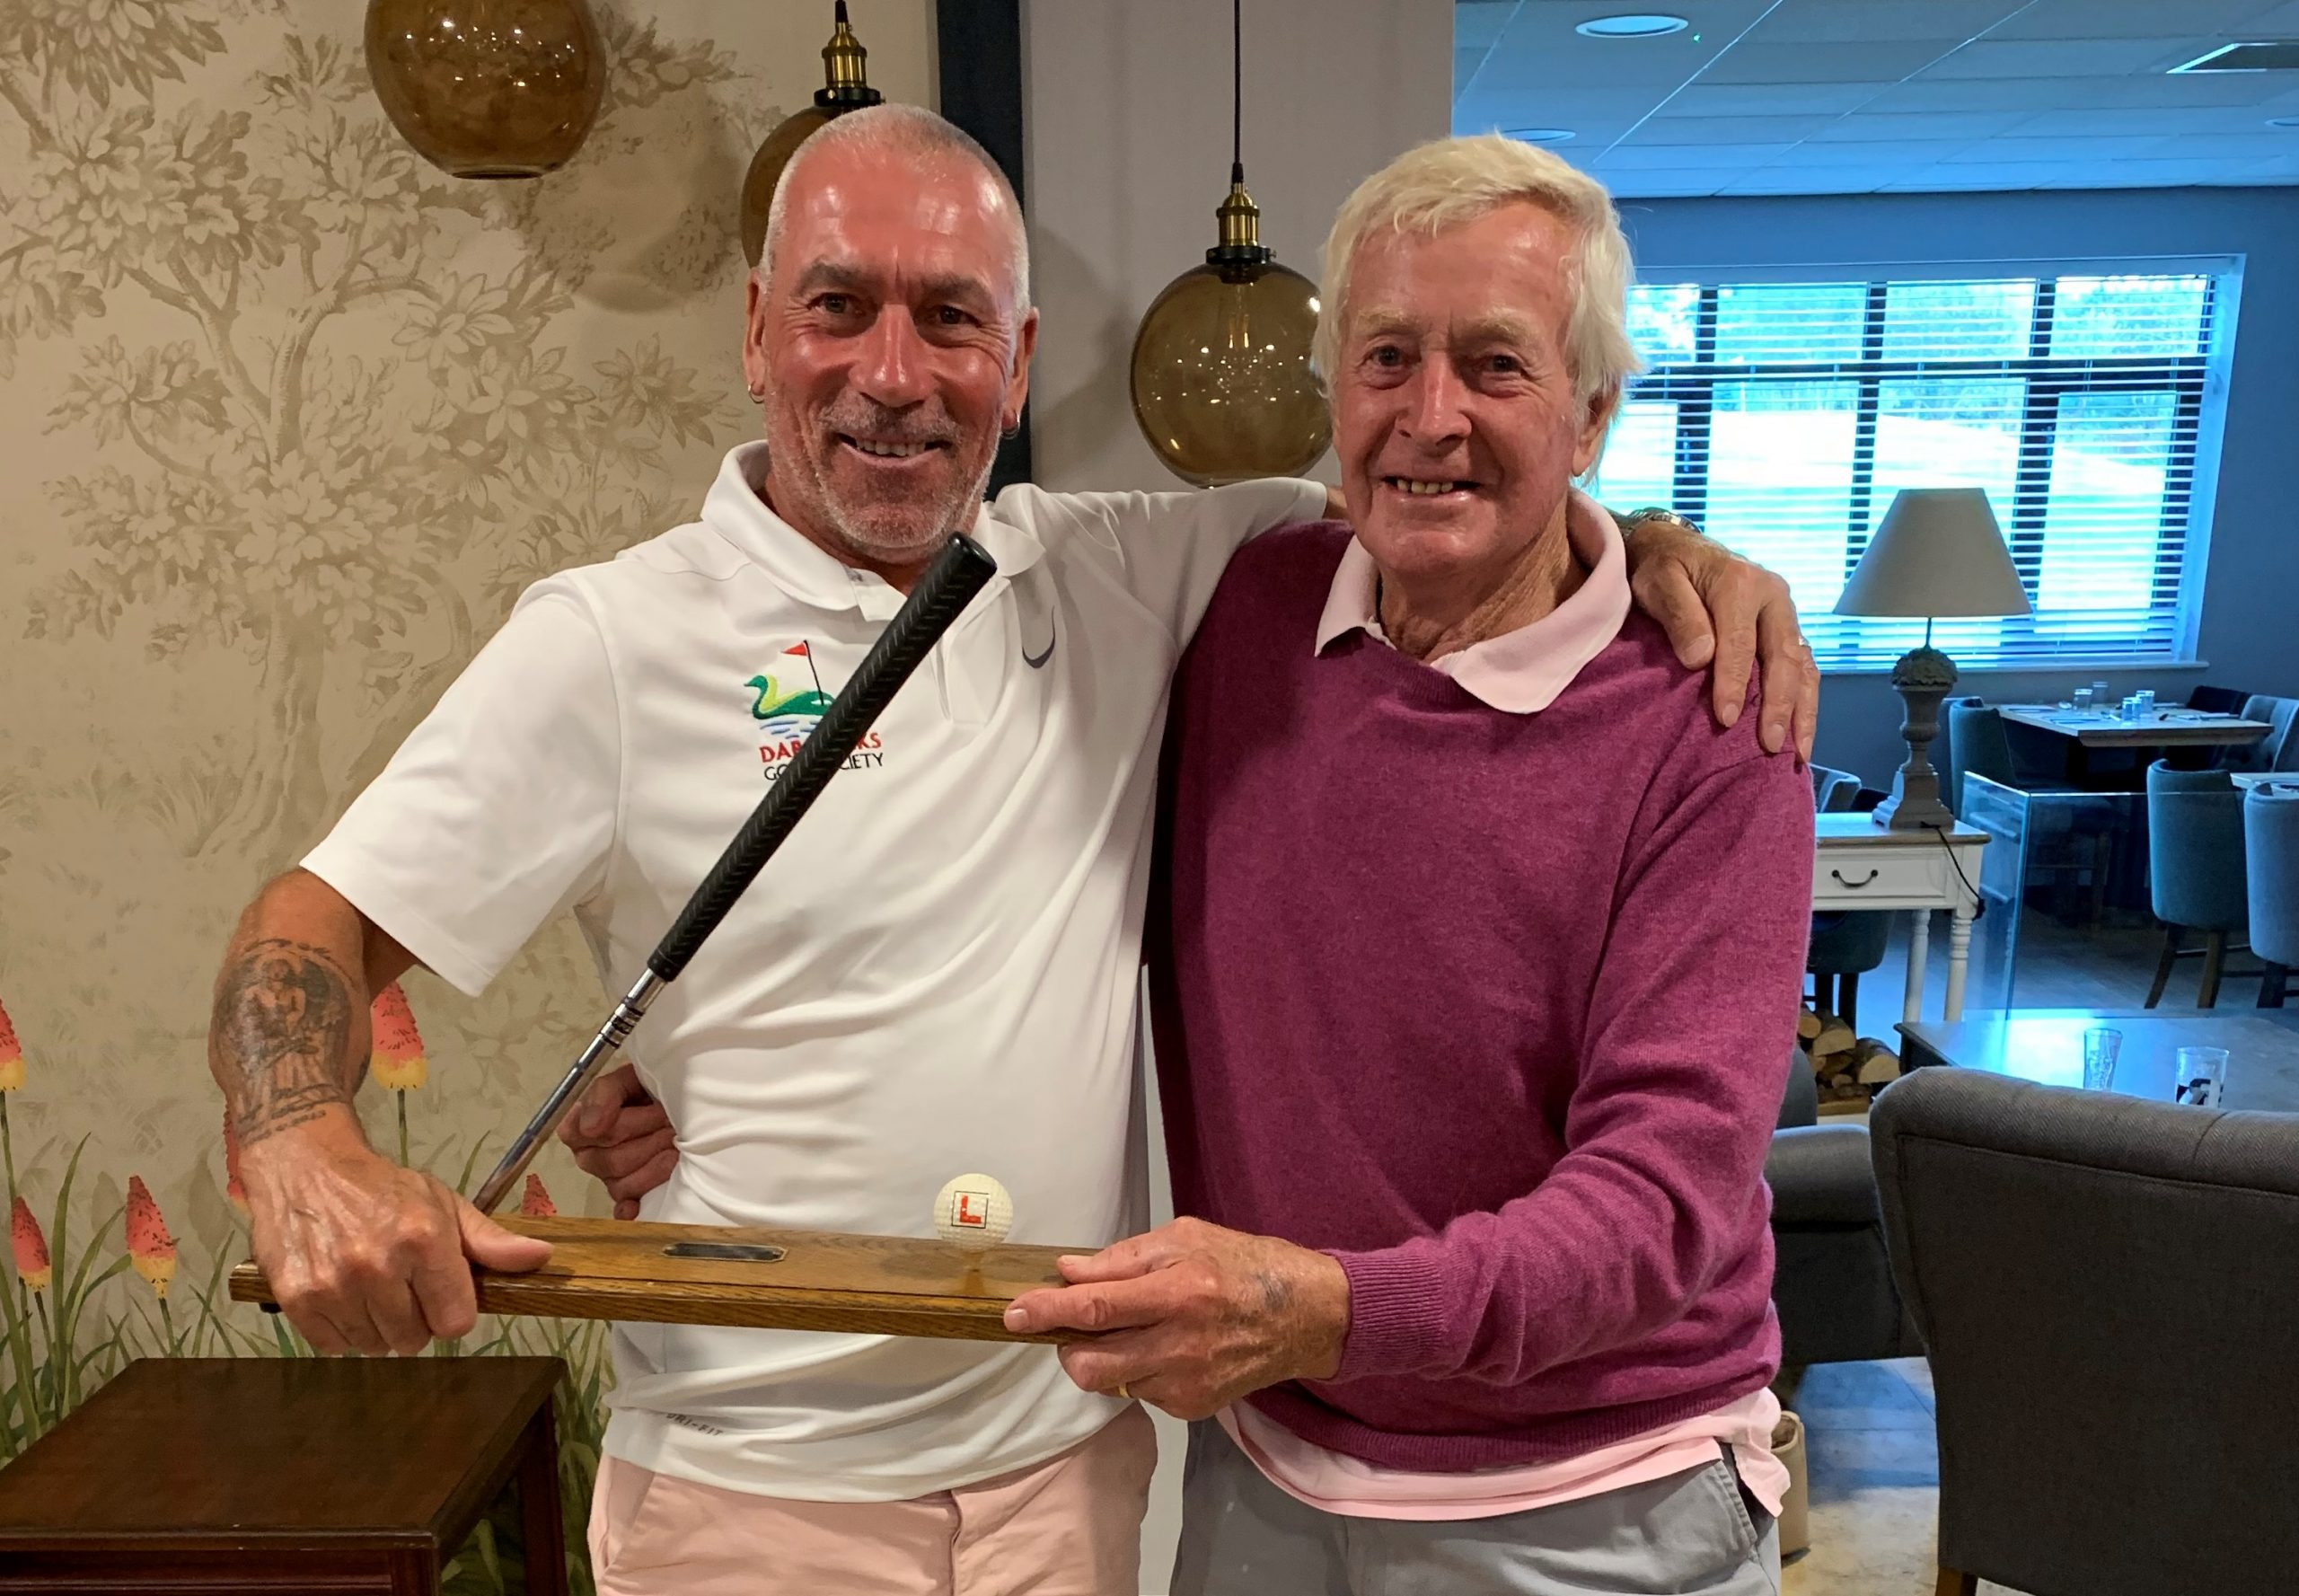 Pete Keen & Donald Barnes enjoy the wrestle for 'winning' the Buried Head Trophy!